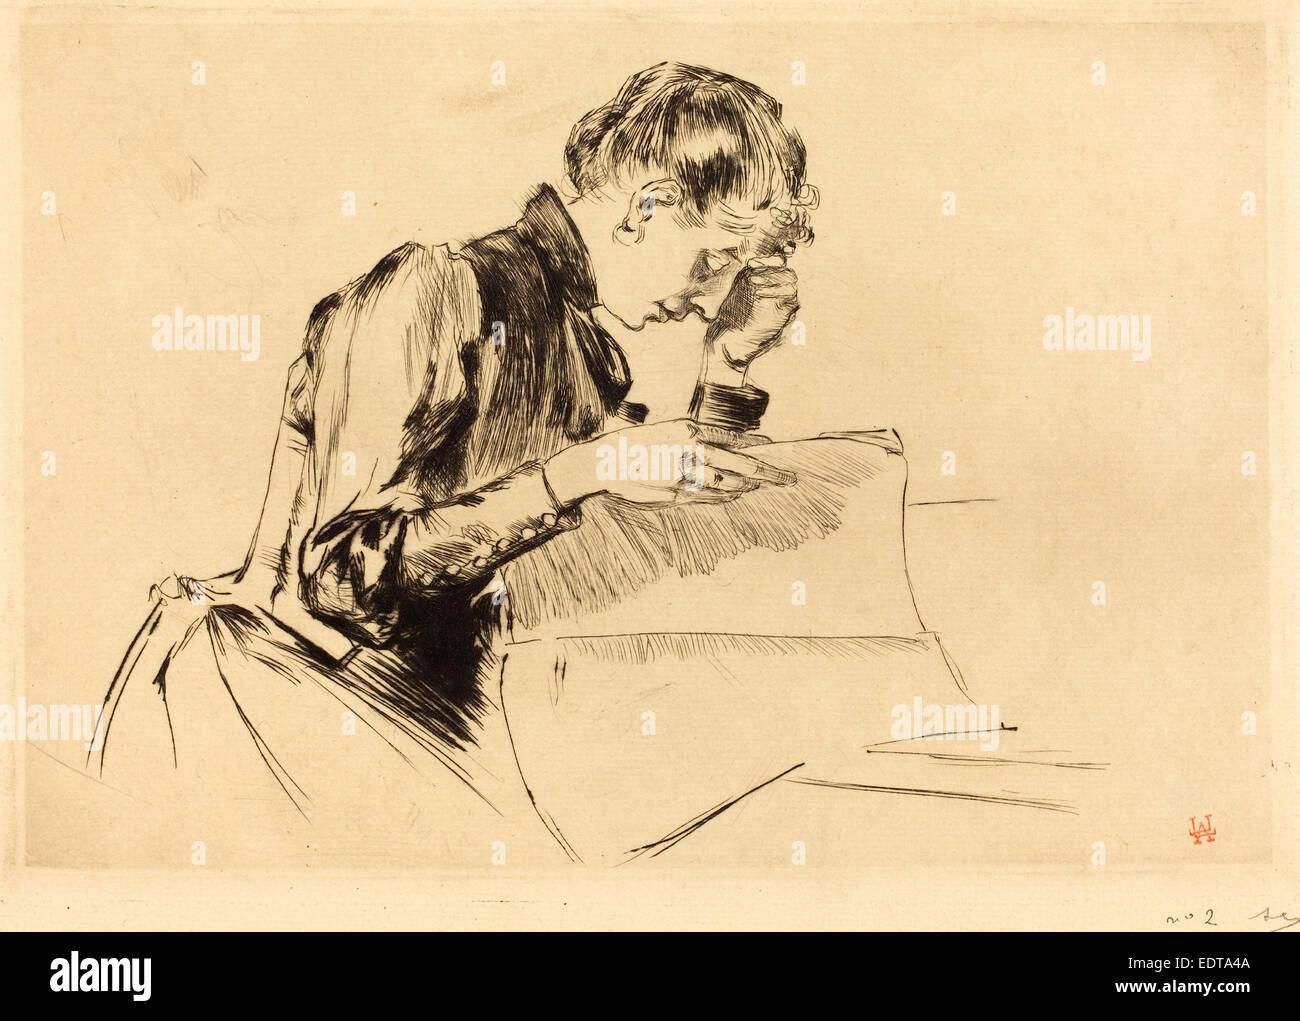 Auguste Lepère (francese, 1849 - 1918), le immagini (Les immagini), 1889, puntasecca Immagini Stock